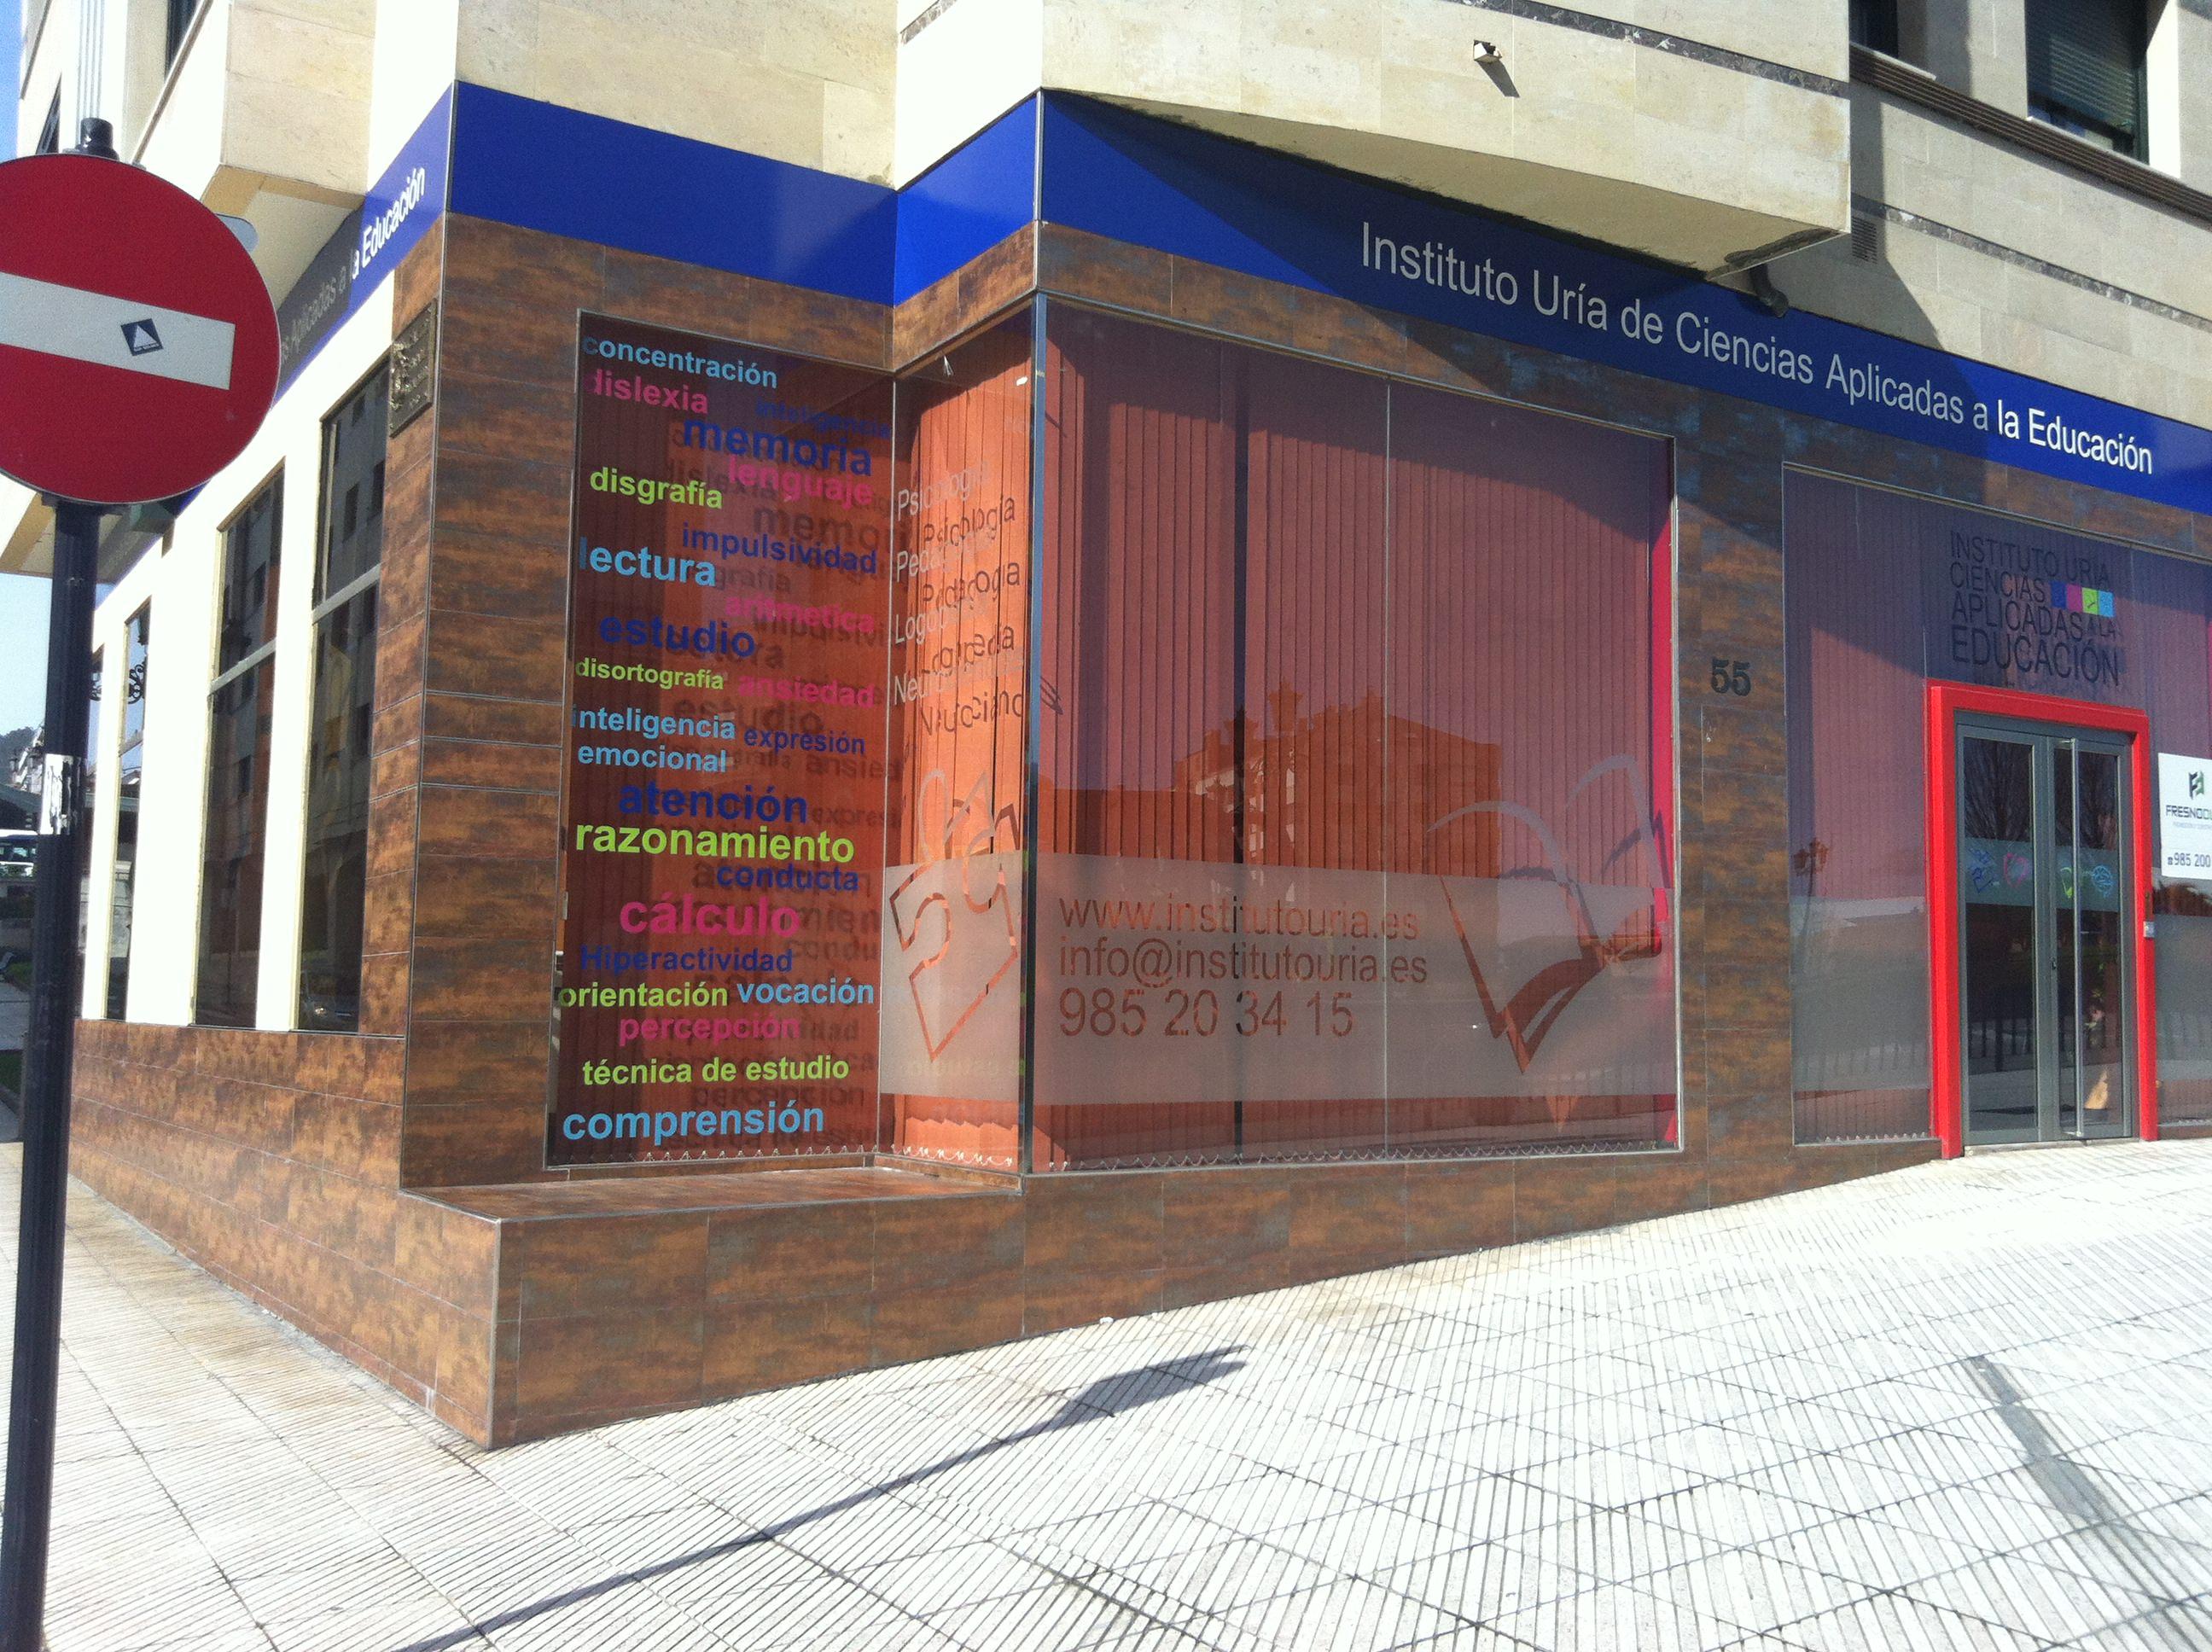 Instituto Uría Oviedo